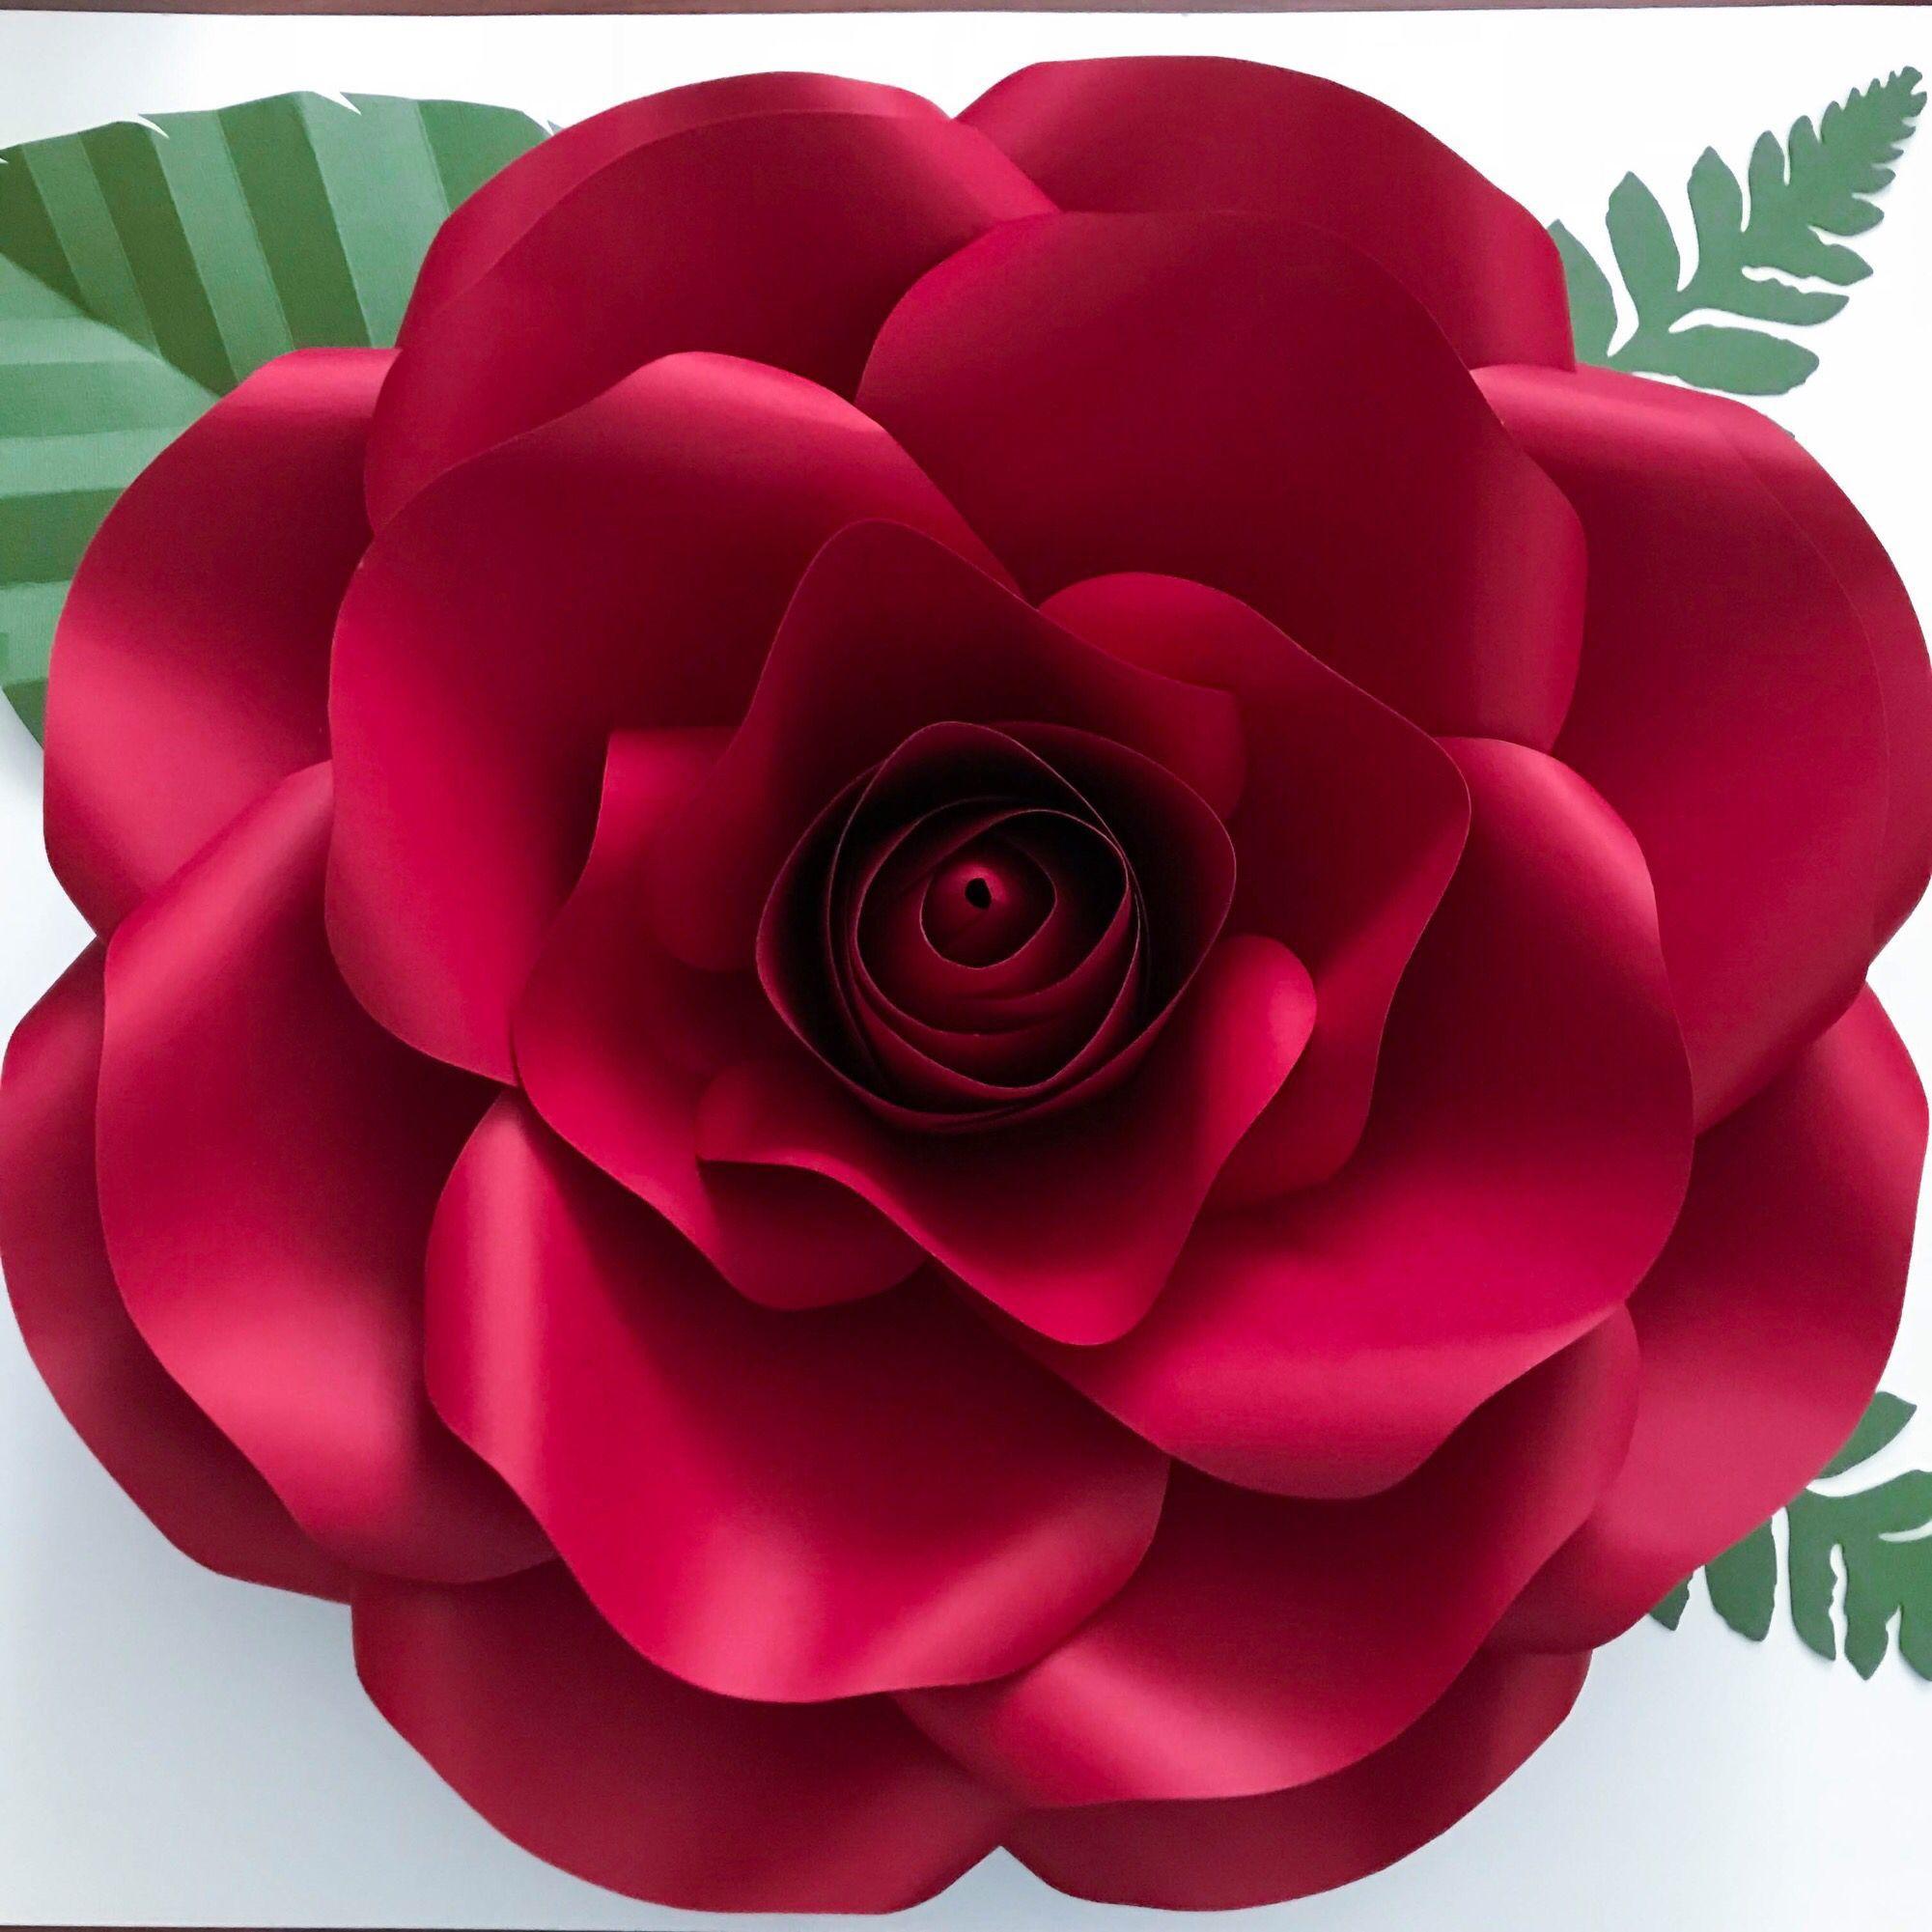 005 Fantastic Large Rose Paper Flower Template Free Example Full